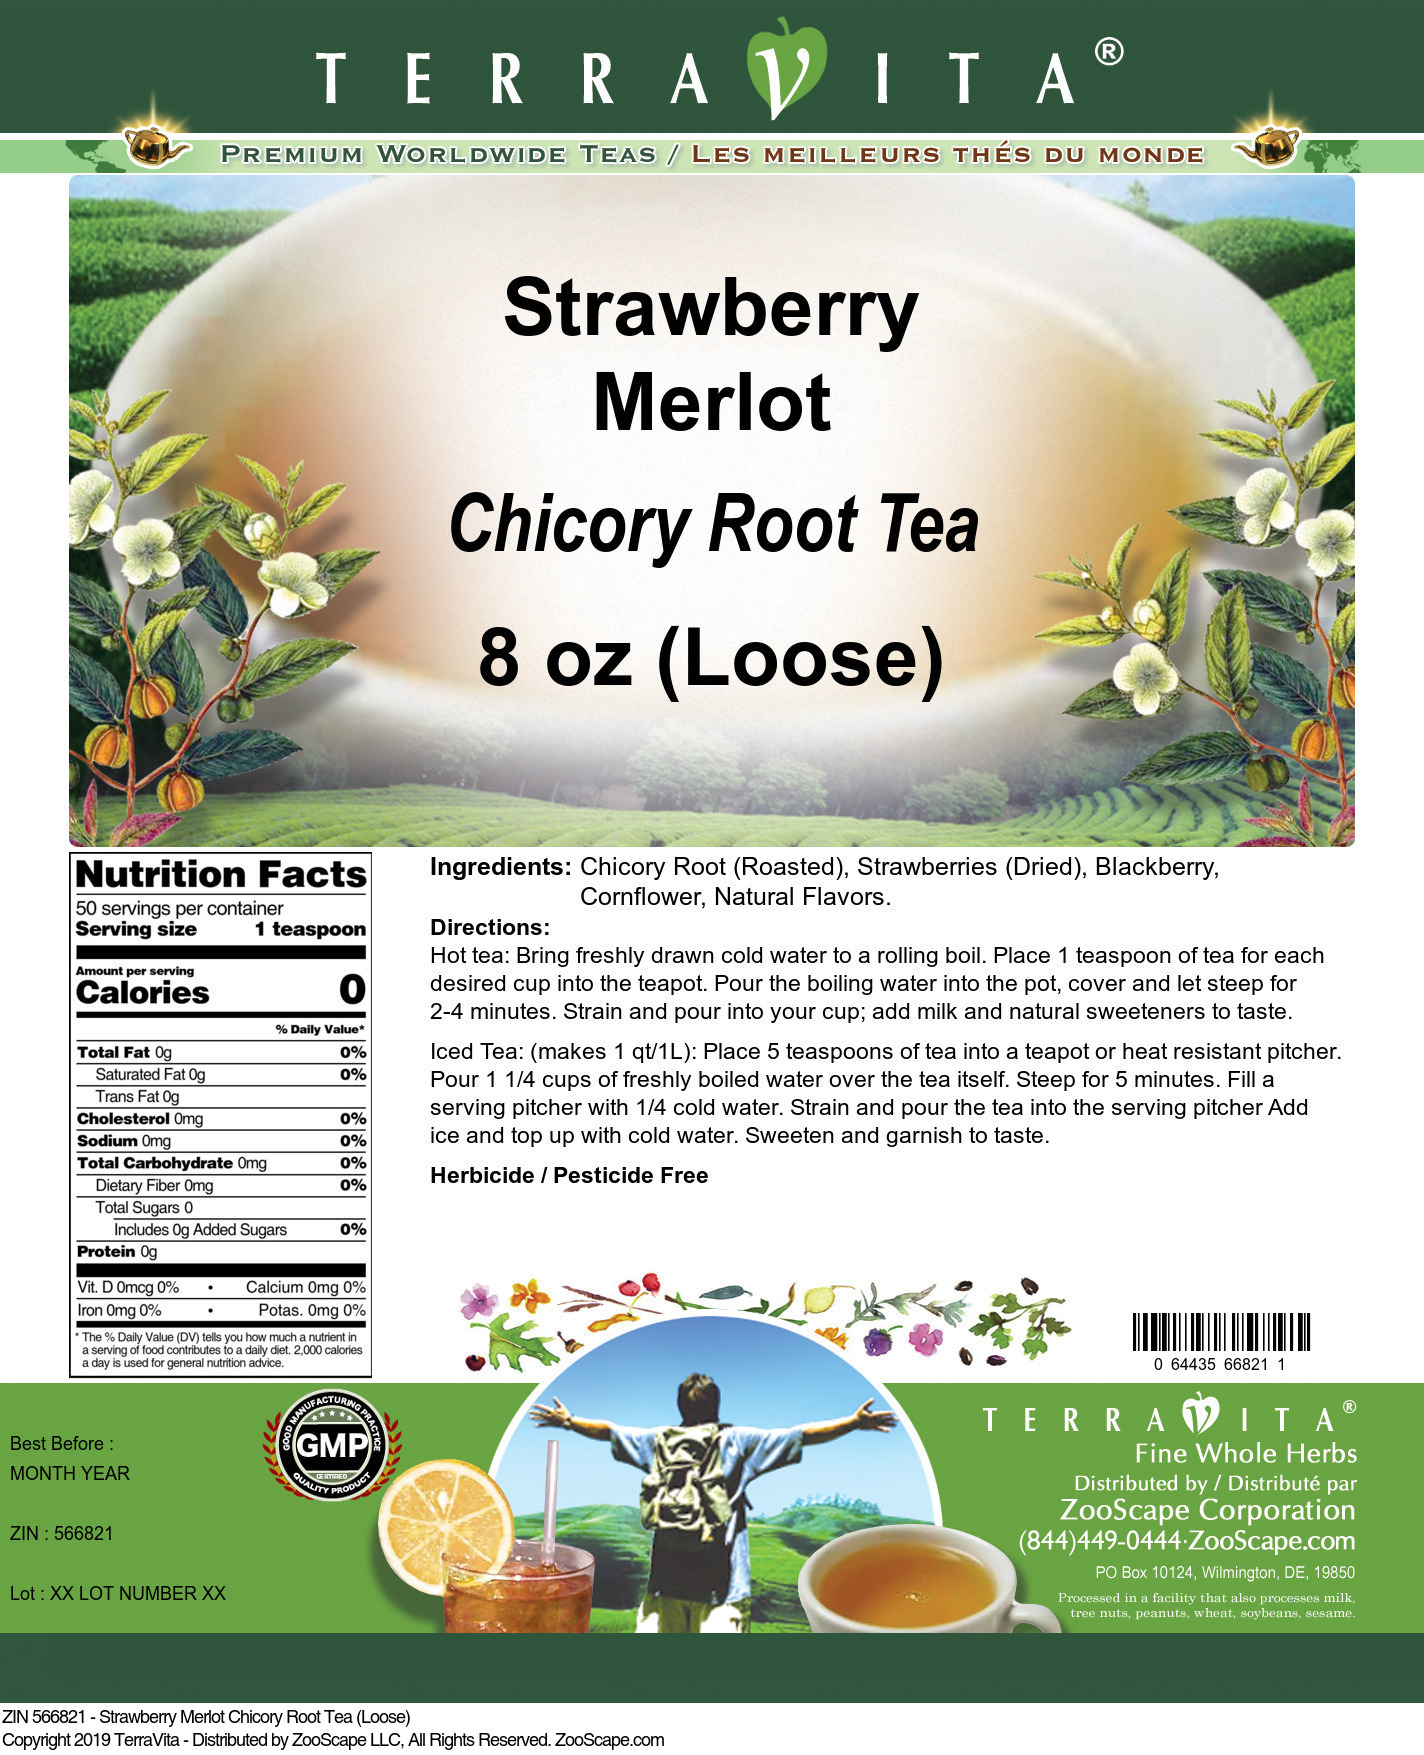 Strawberry Merlot Chicory Root Tea (Loose)